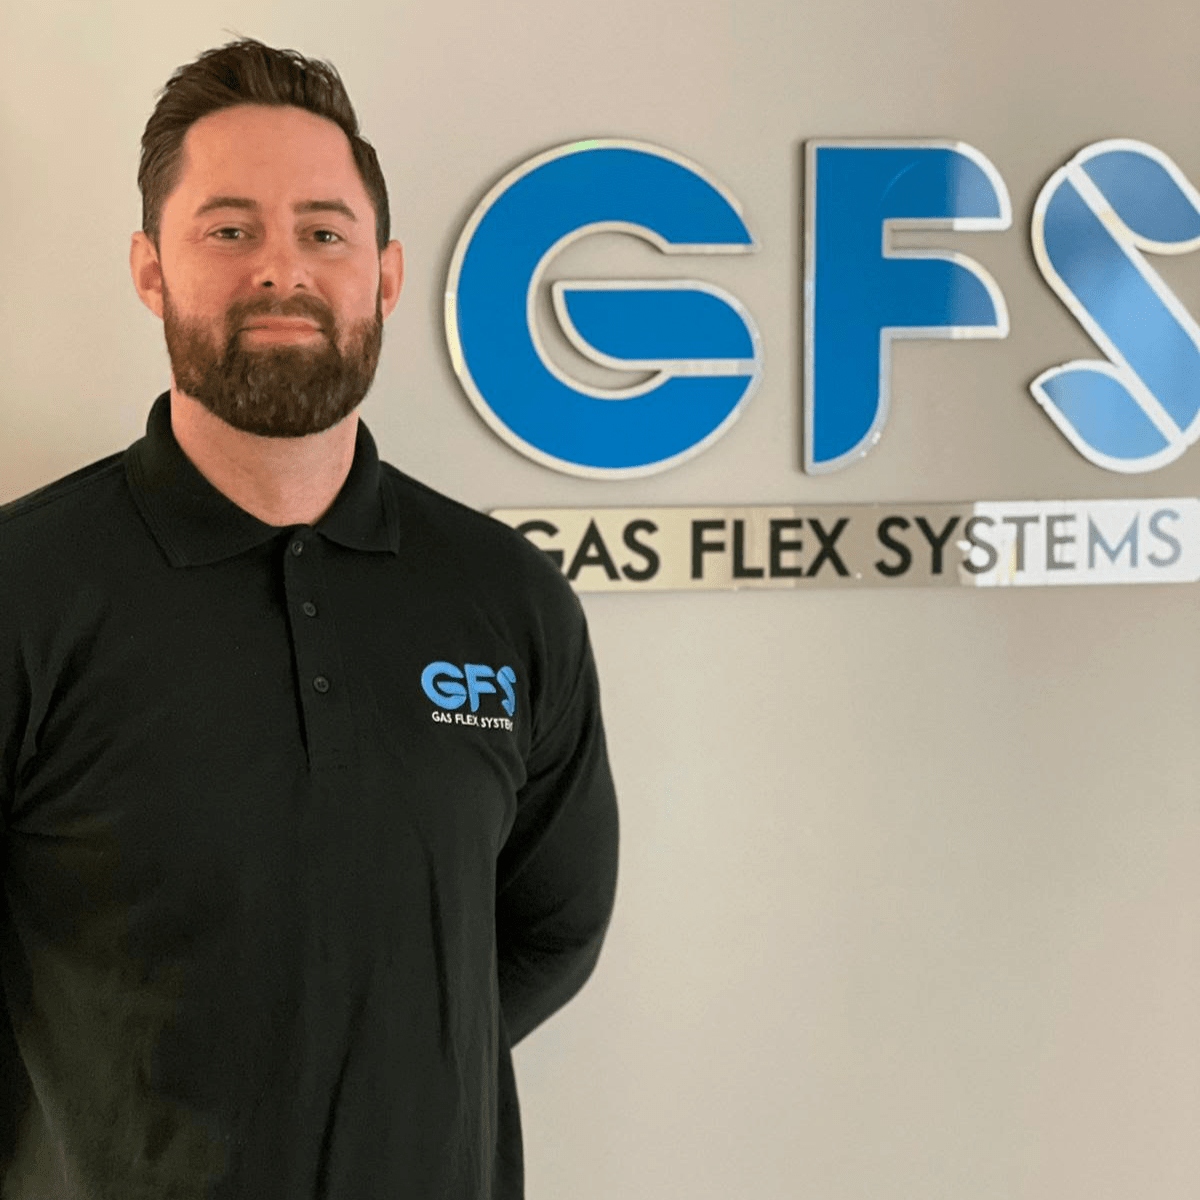 GFS welcome GFS CSST expert, Miles Errington